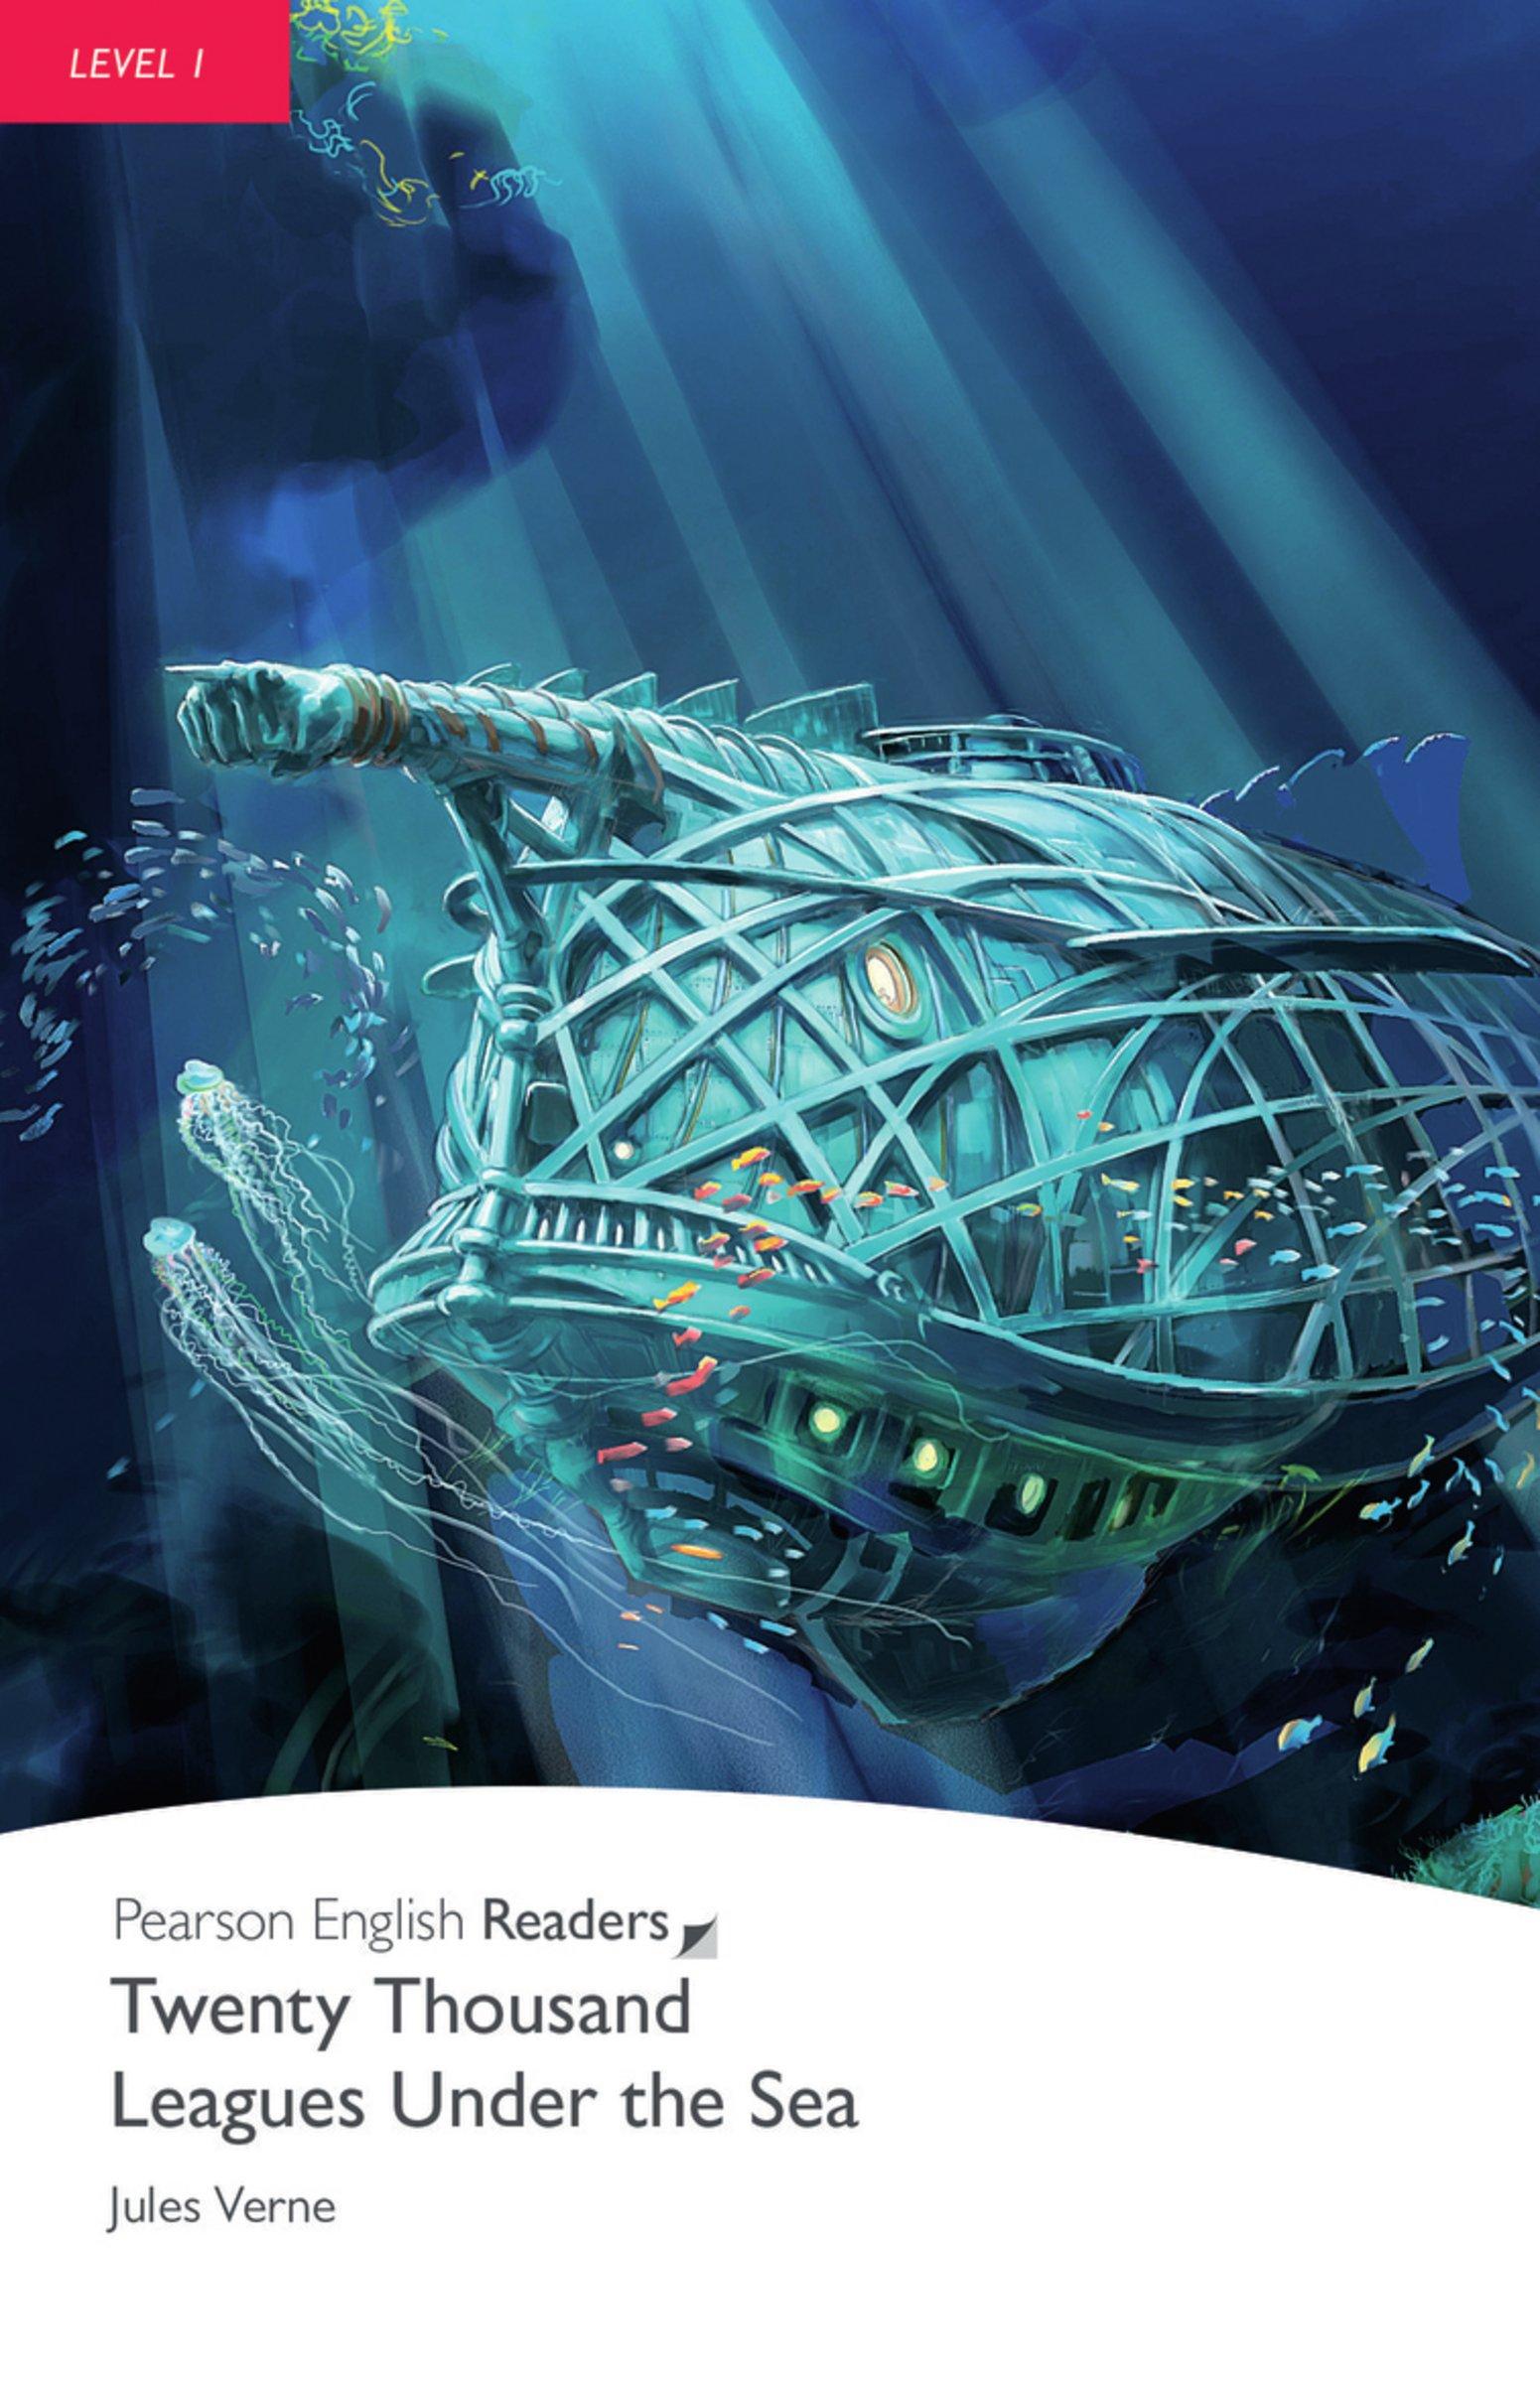 Twenty Thousand Leagues Under the Sea - Leichte Englisch-Lektüre (A1) (Pearson Readers - Level 1)